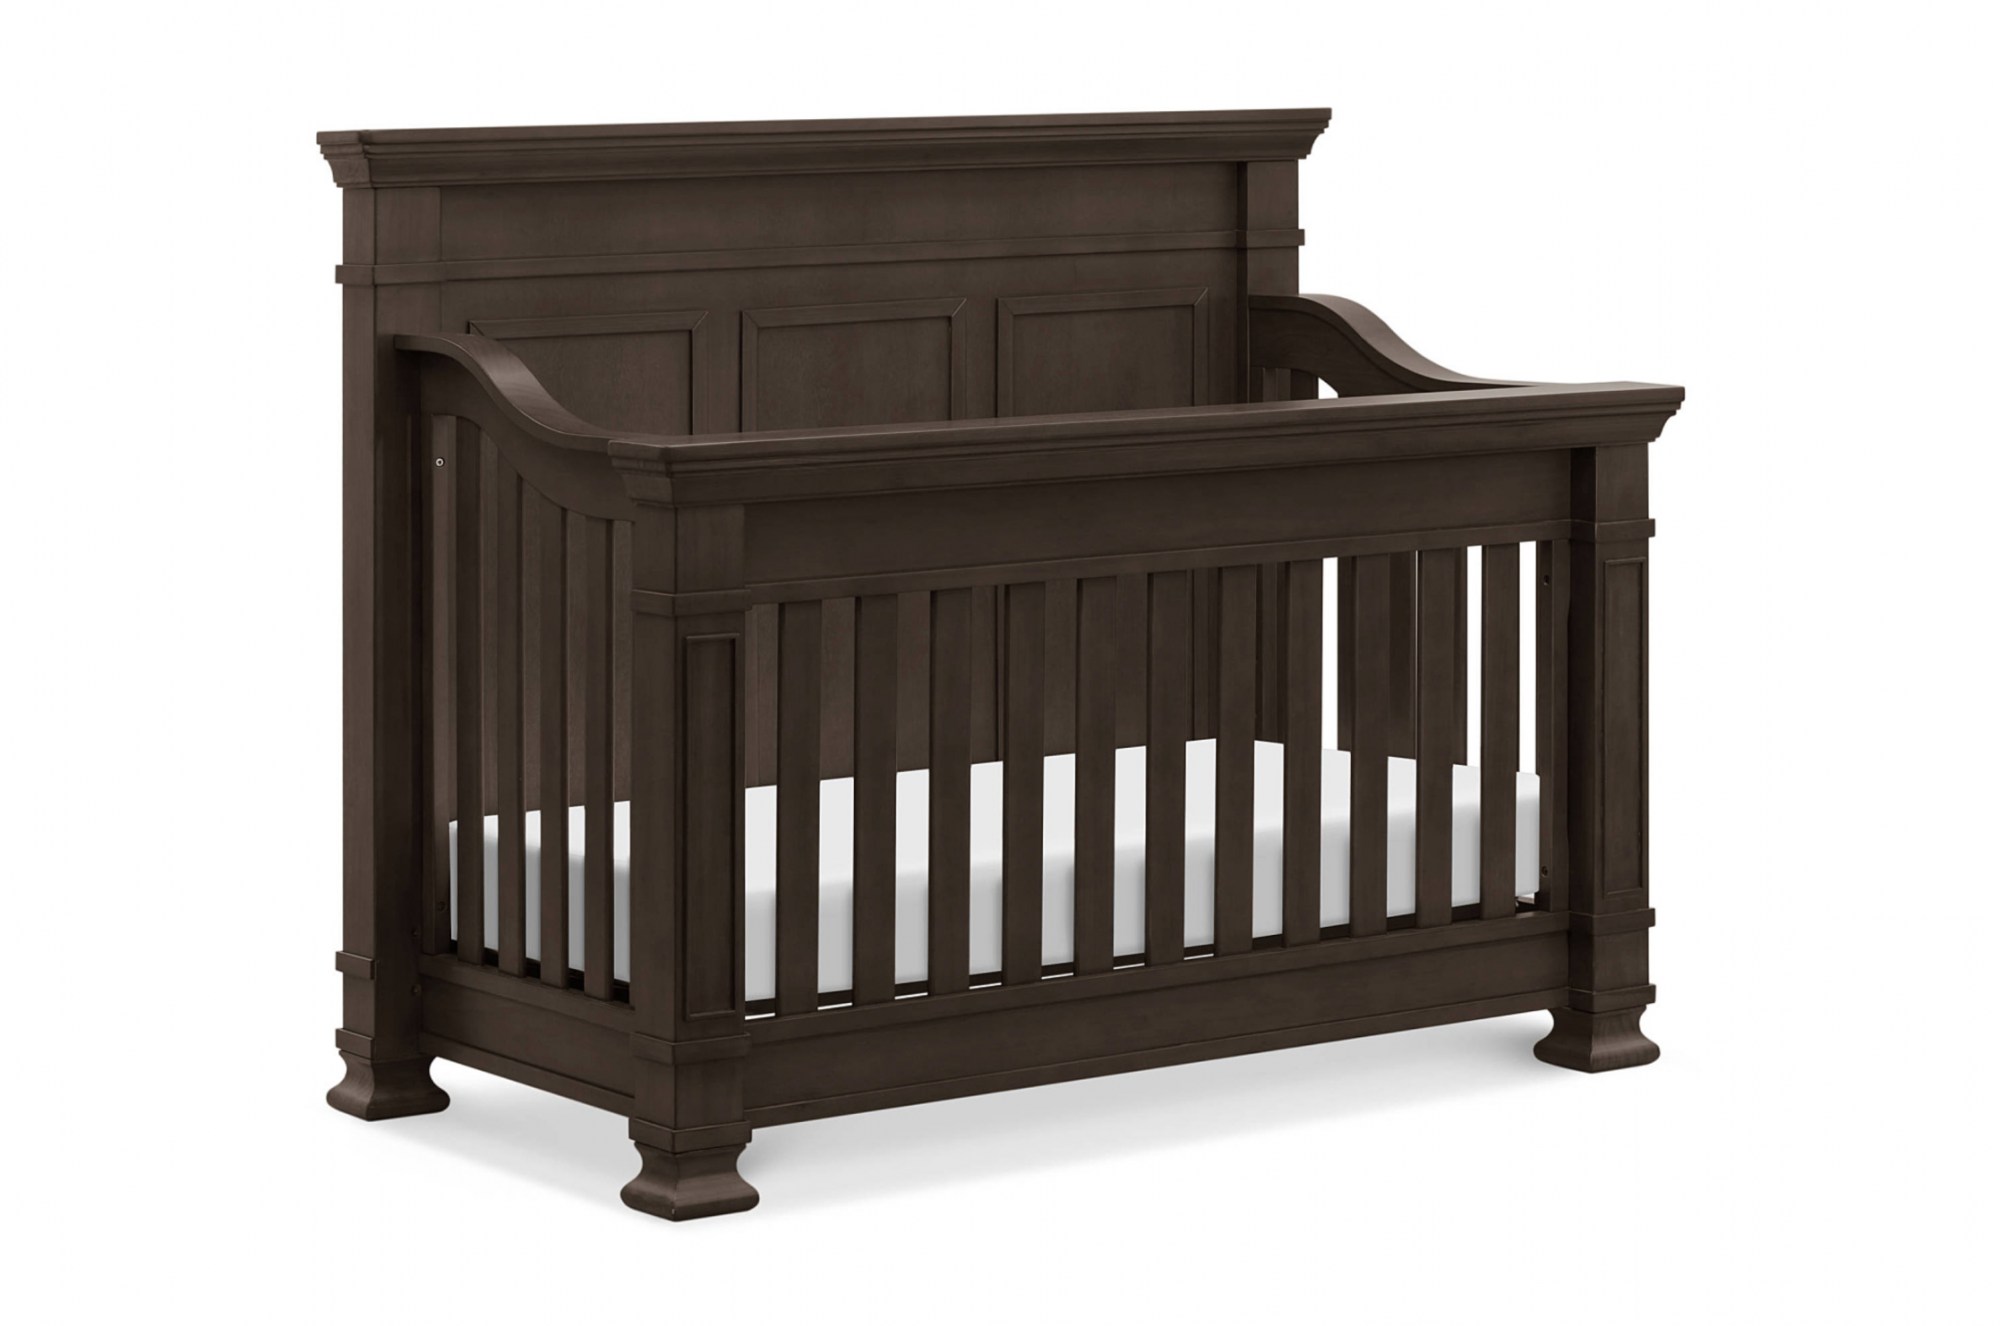 Franklin & Ben | Tillen | 4-in-1 Convertible Crib